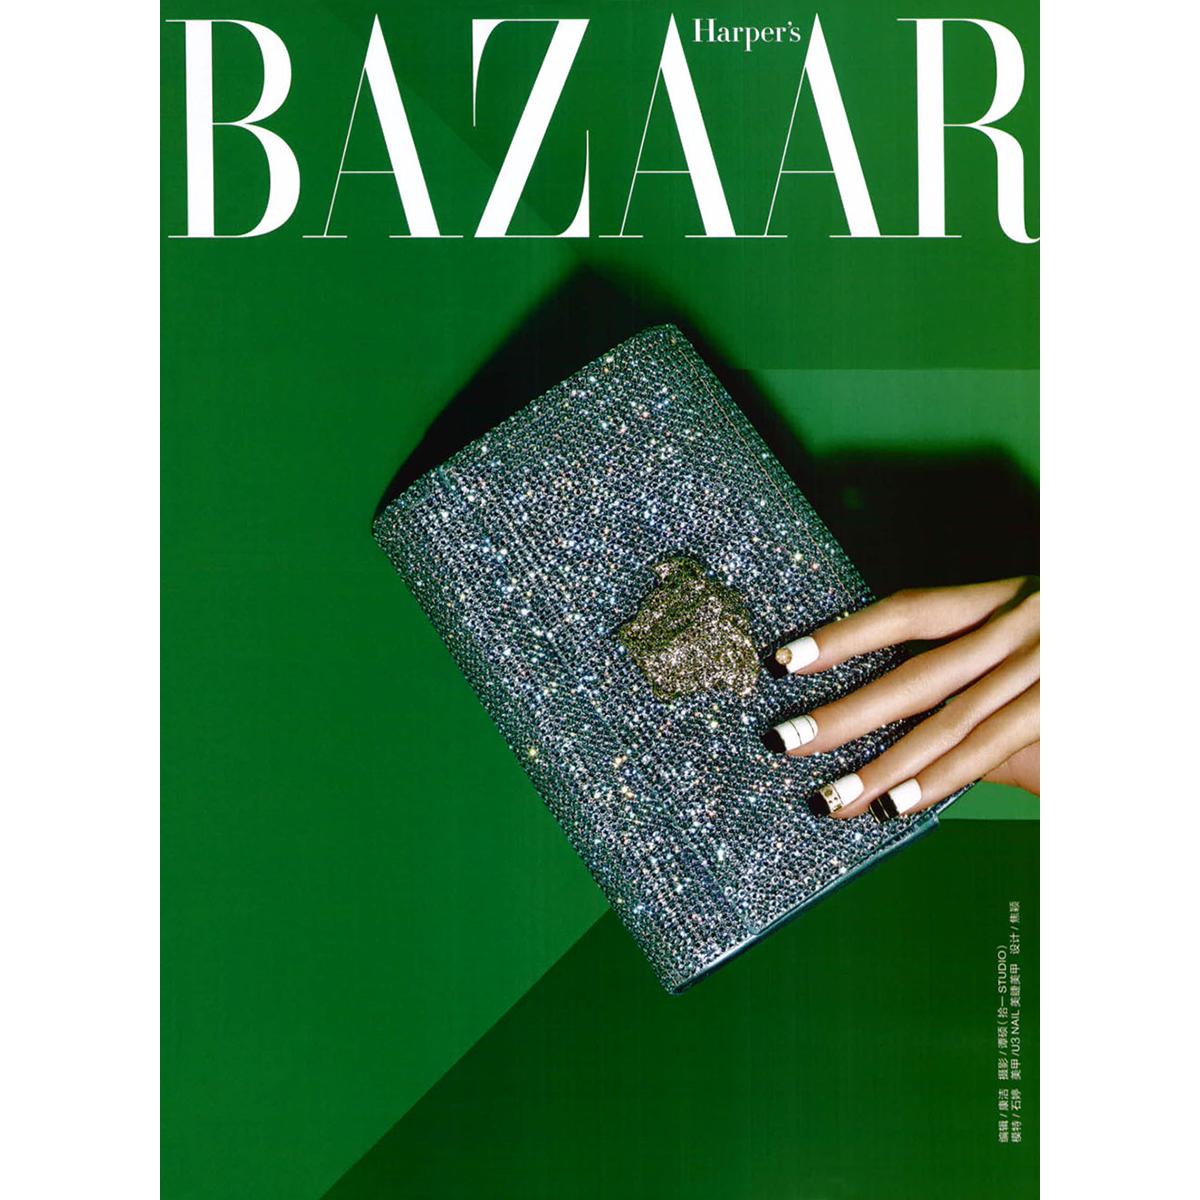 #VersaceEditorials - Glossy green. Harper's Bazaar China - July '15. Editor: Kang Jie Photographer: Tan Shuo